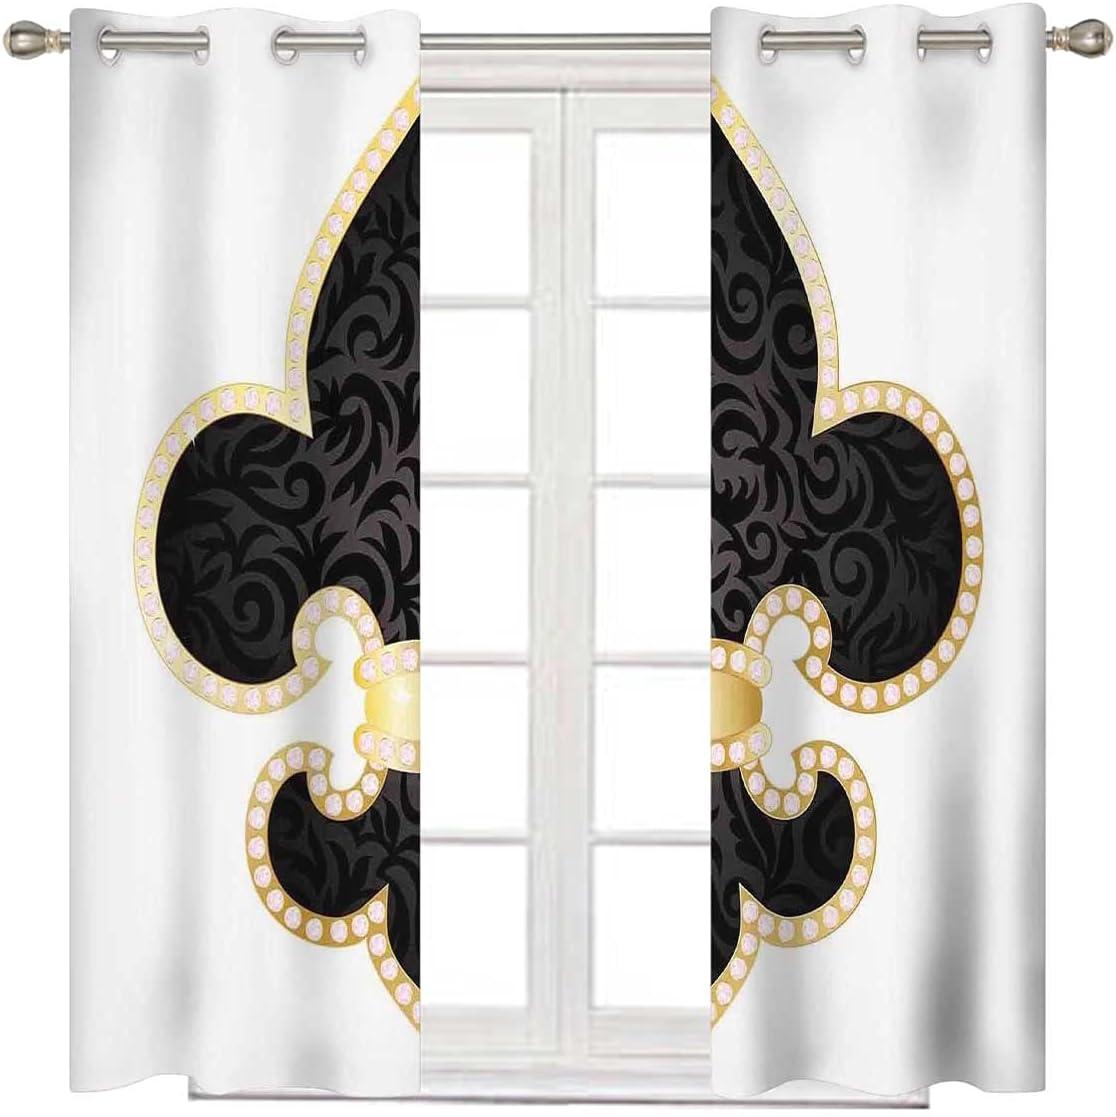 Fleur De Lis Decor Curtains Drapes Max 90% OFF Black Austin Mall Inches 84 Long Gold